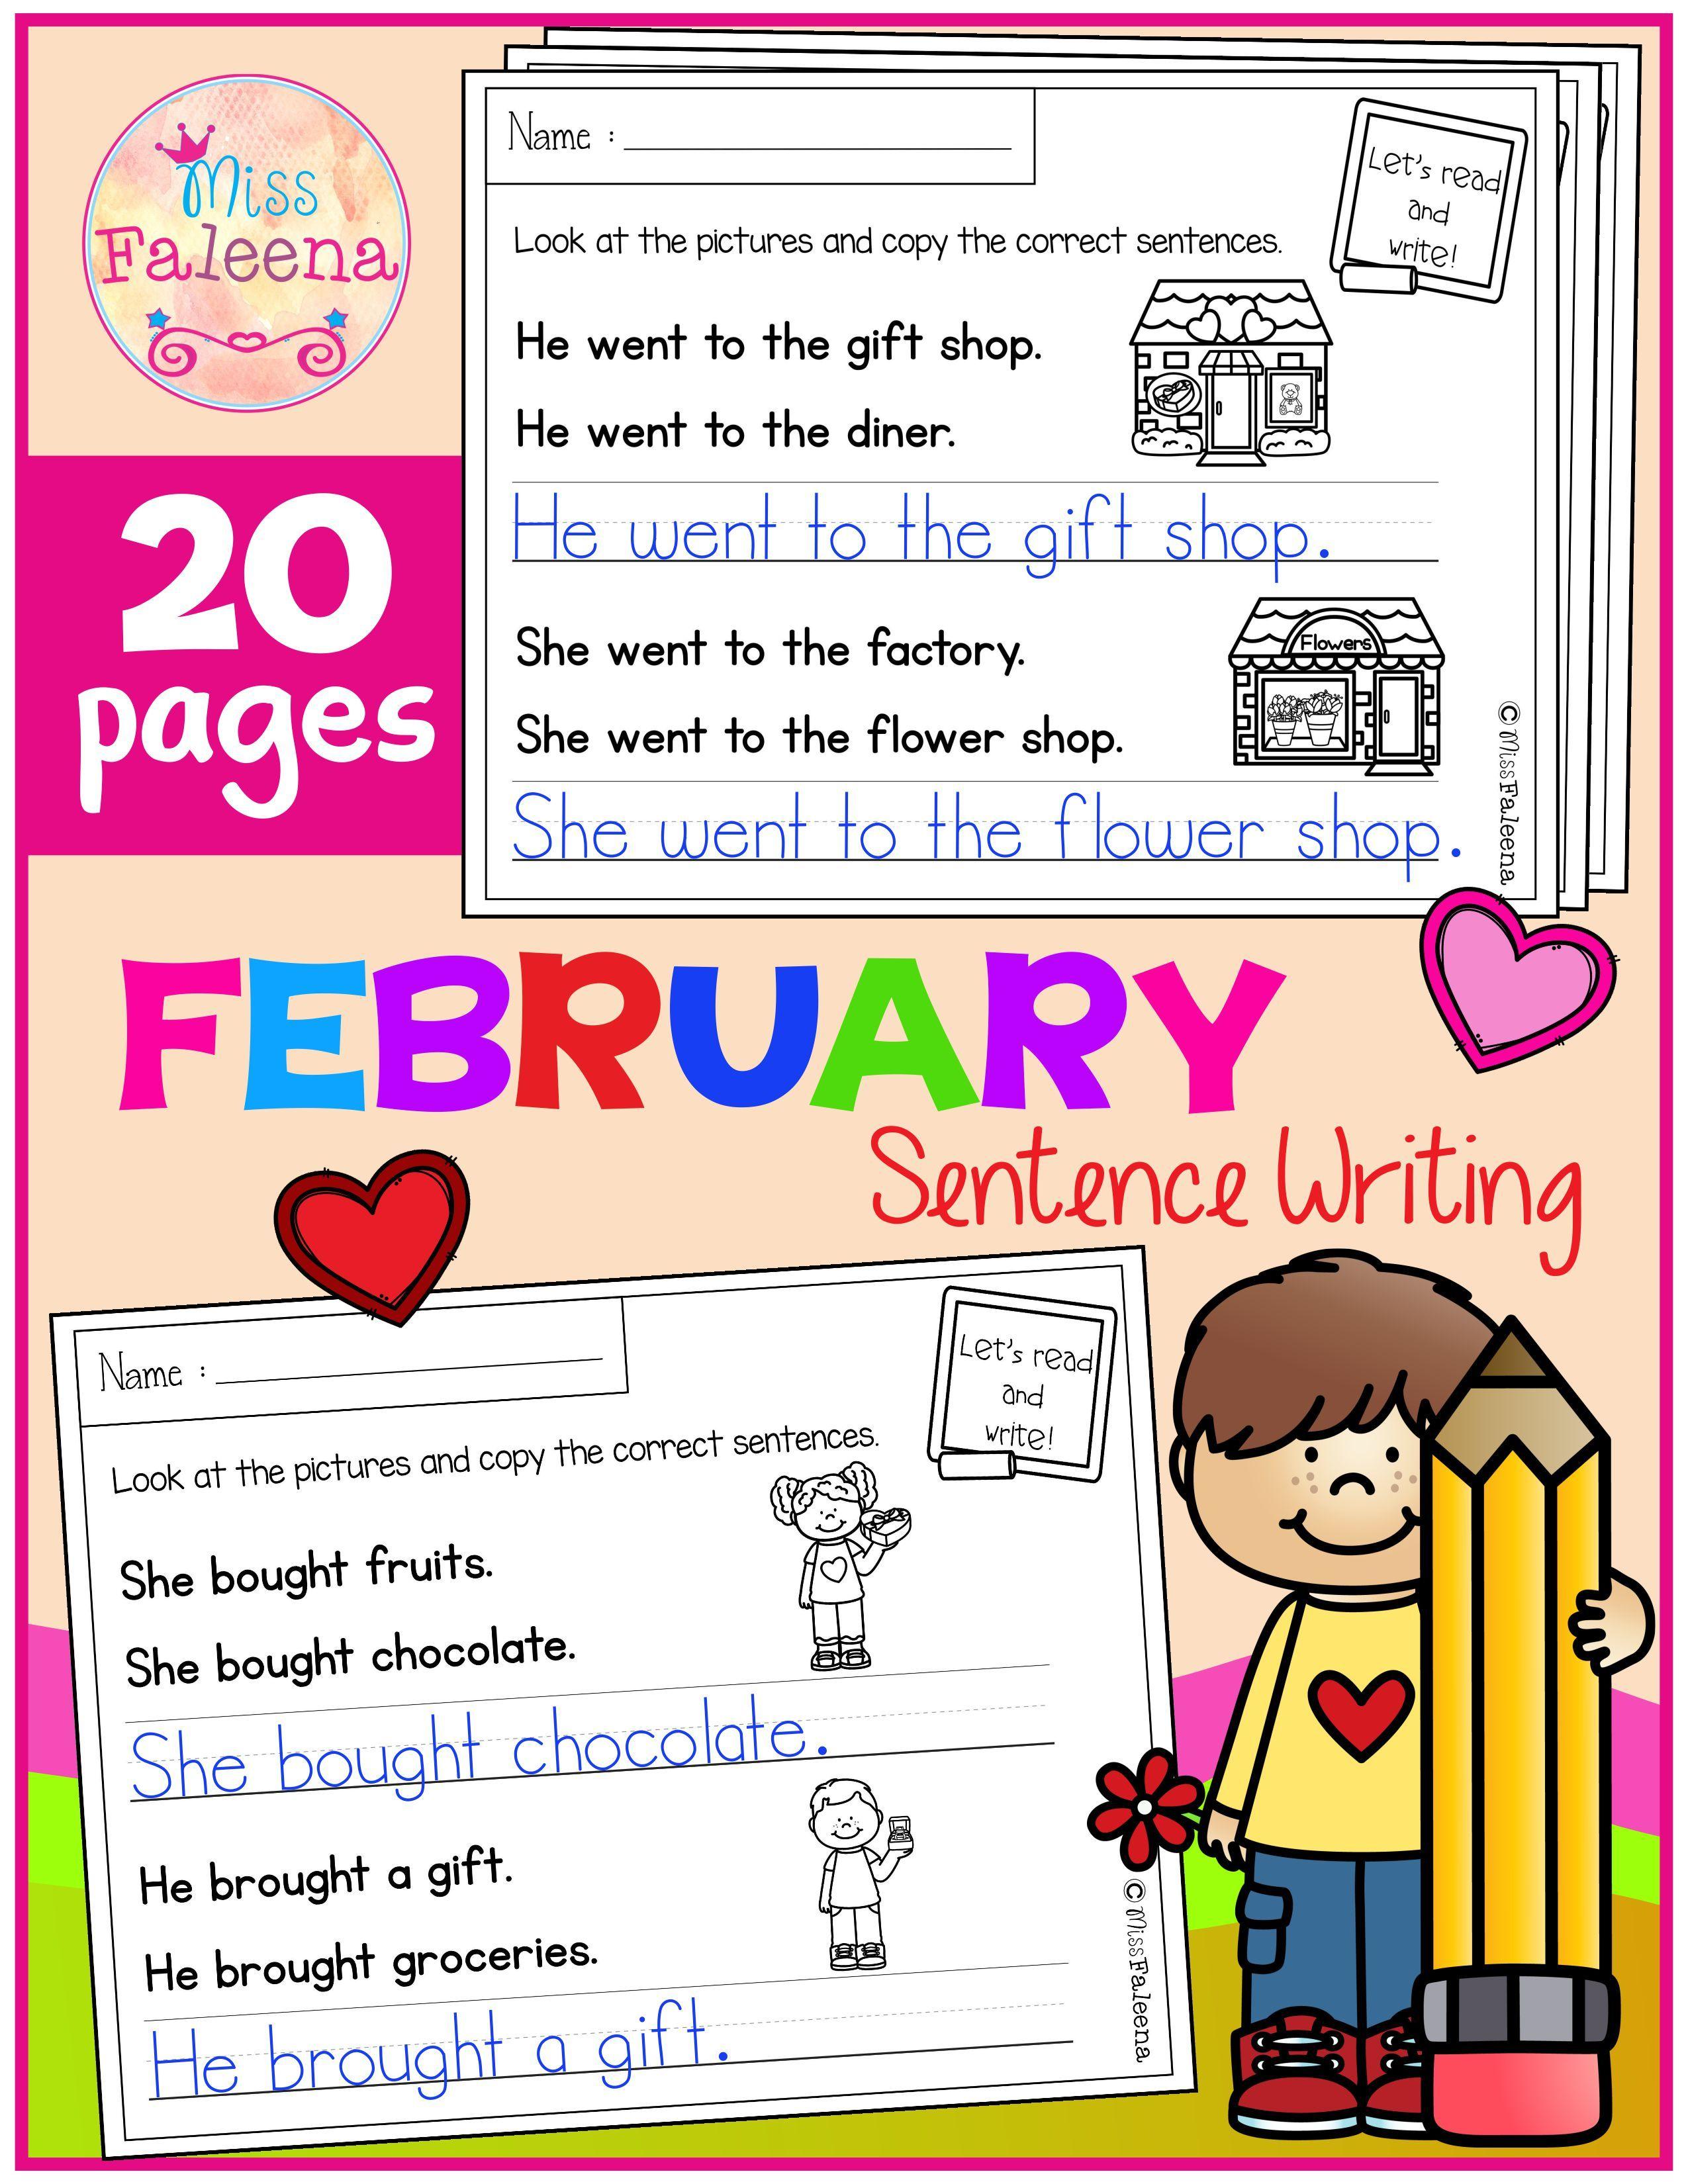 February Sentence Writing